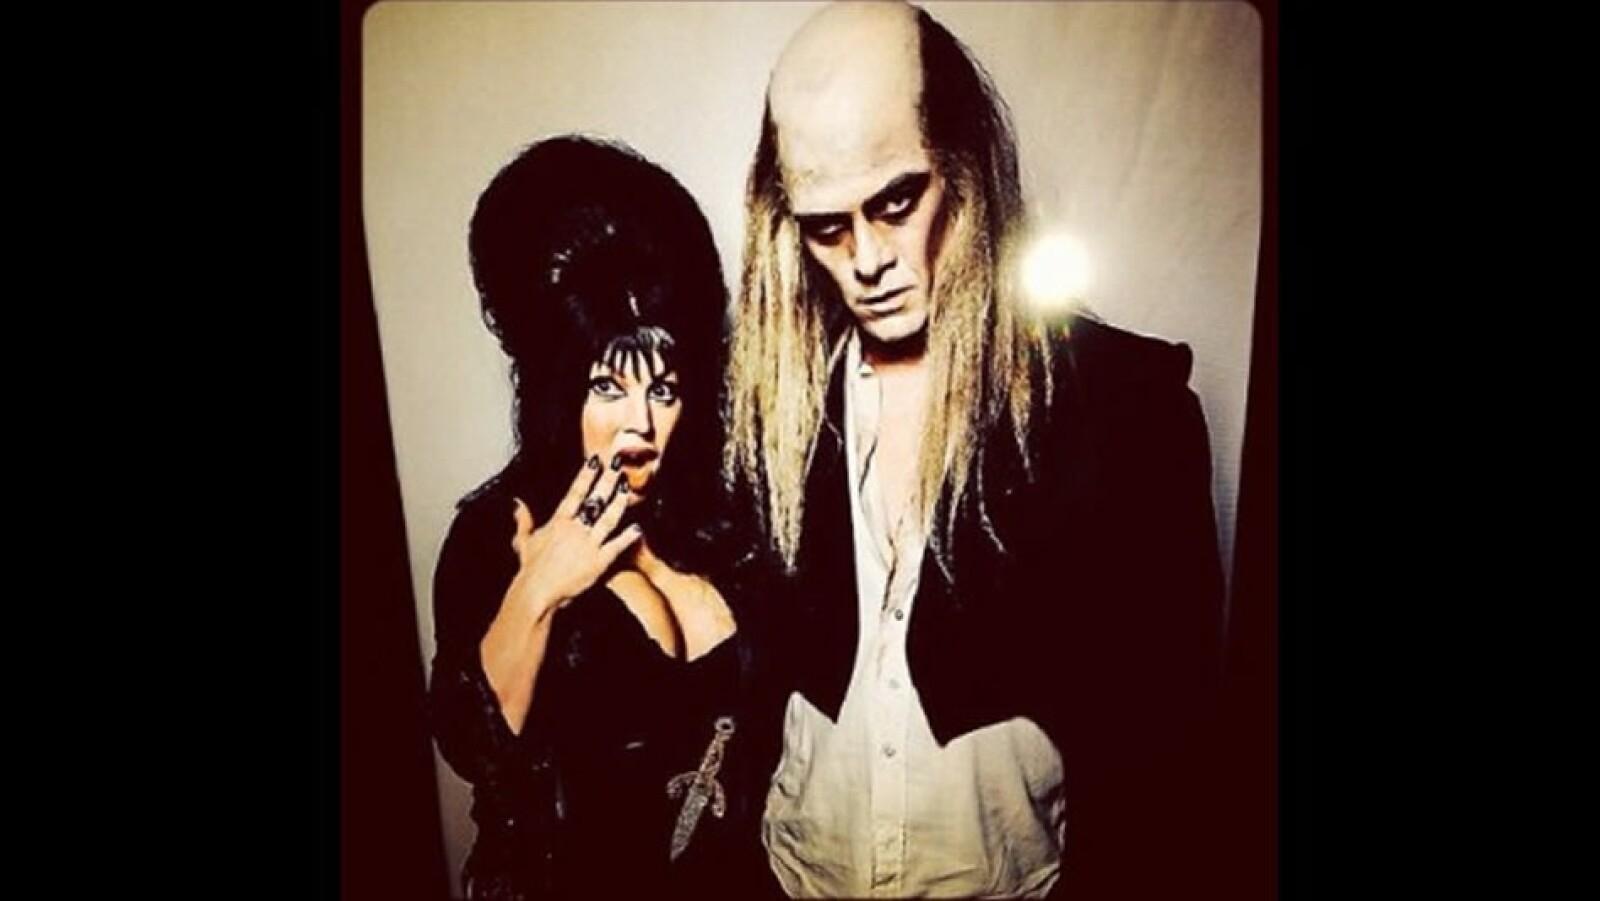 halloween, hollywood, artistas, disfraces, monstruos, cantantes, cultura pop, deportistas, sombrero, capa, guitarra